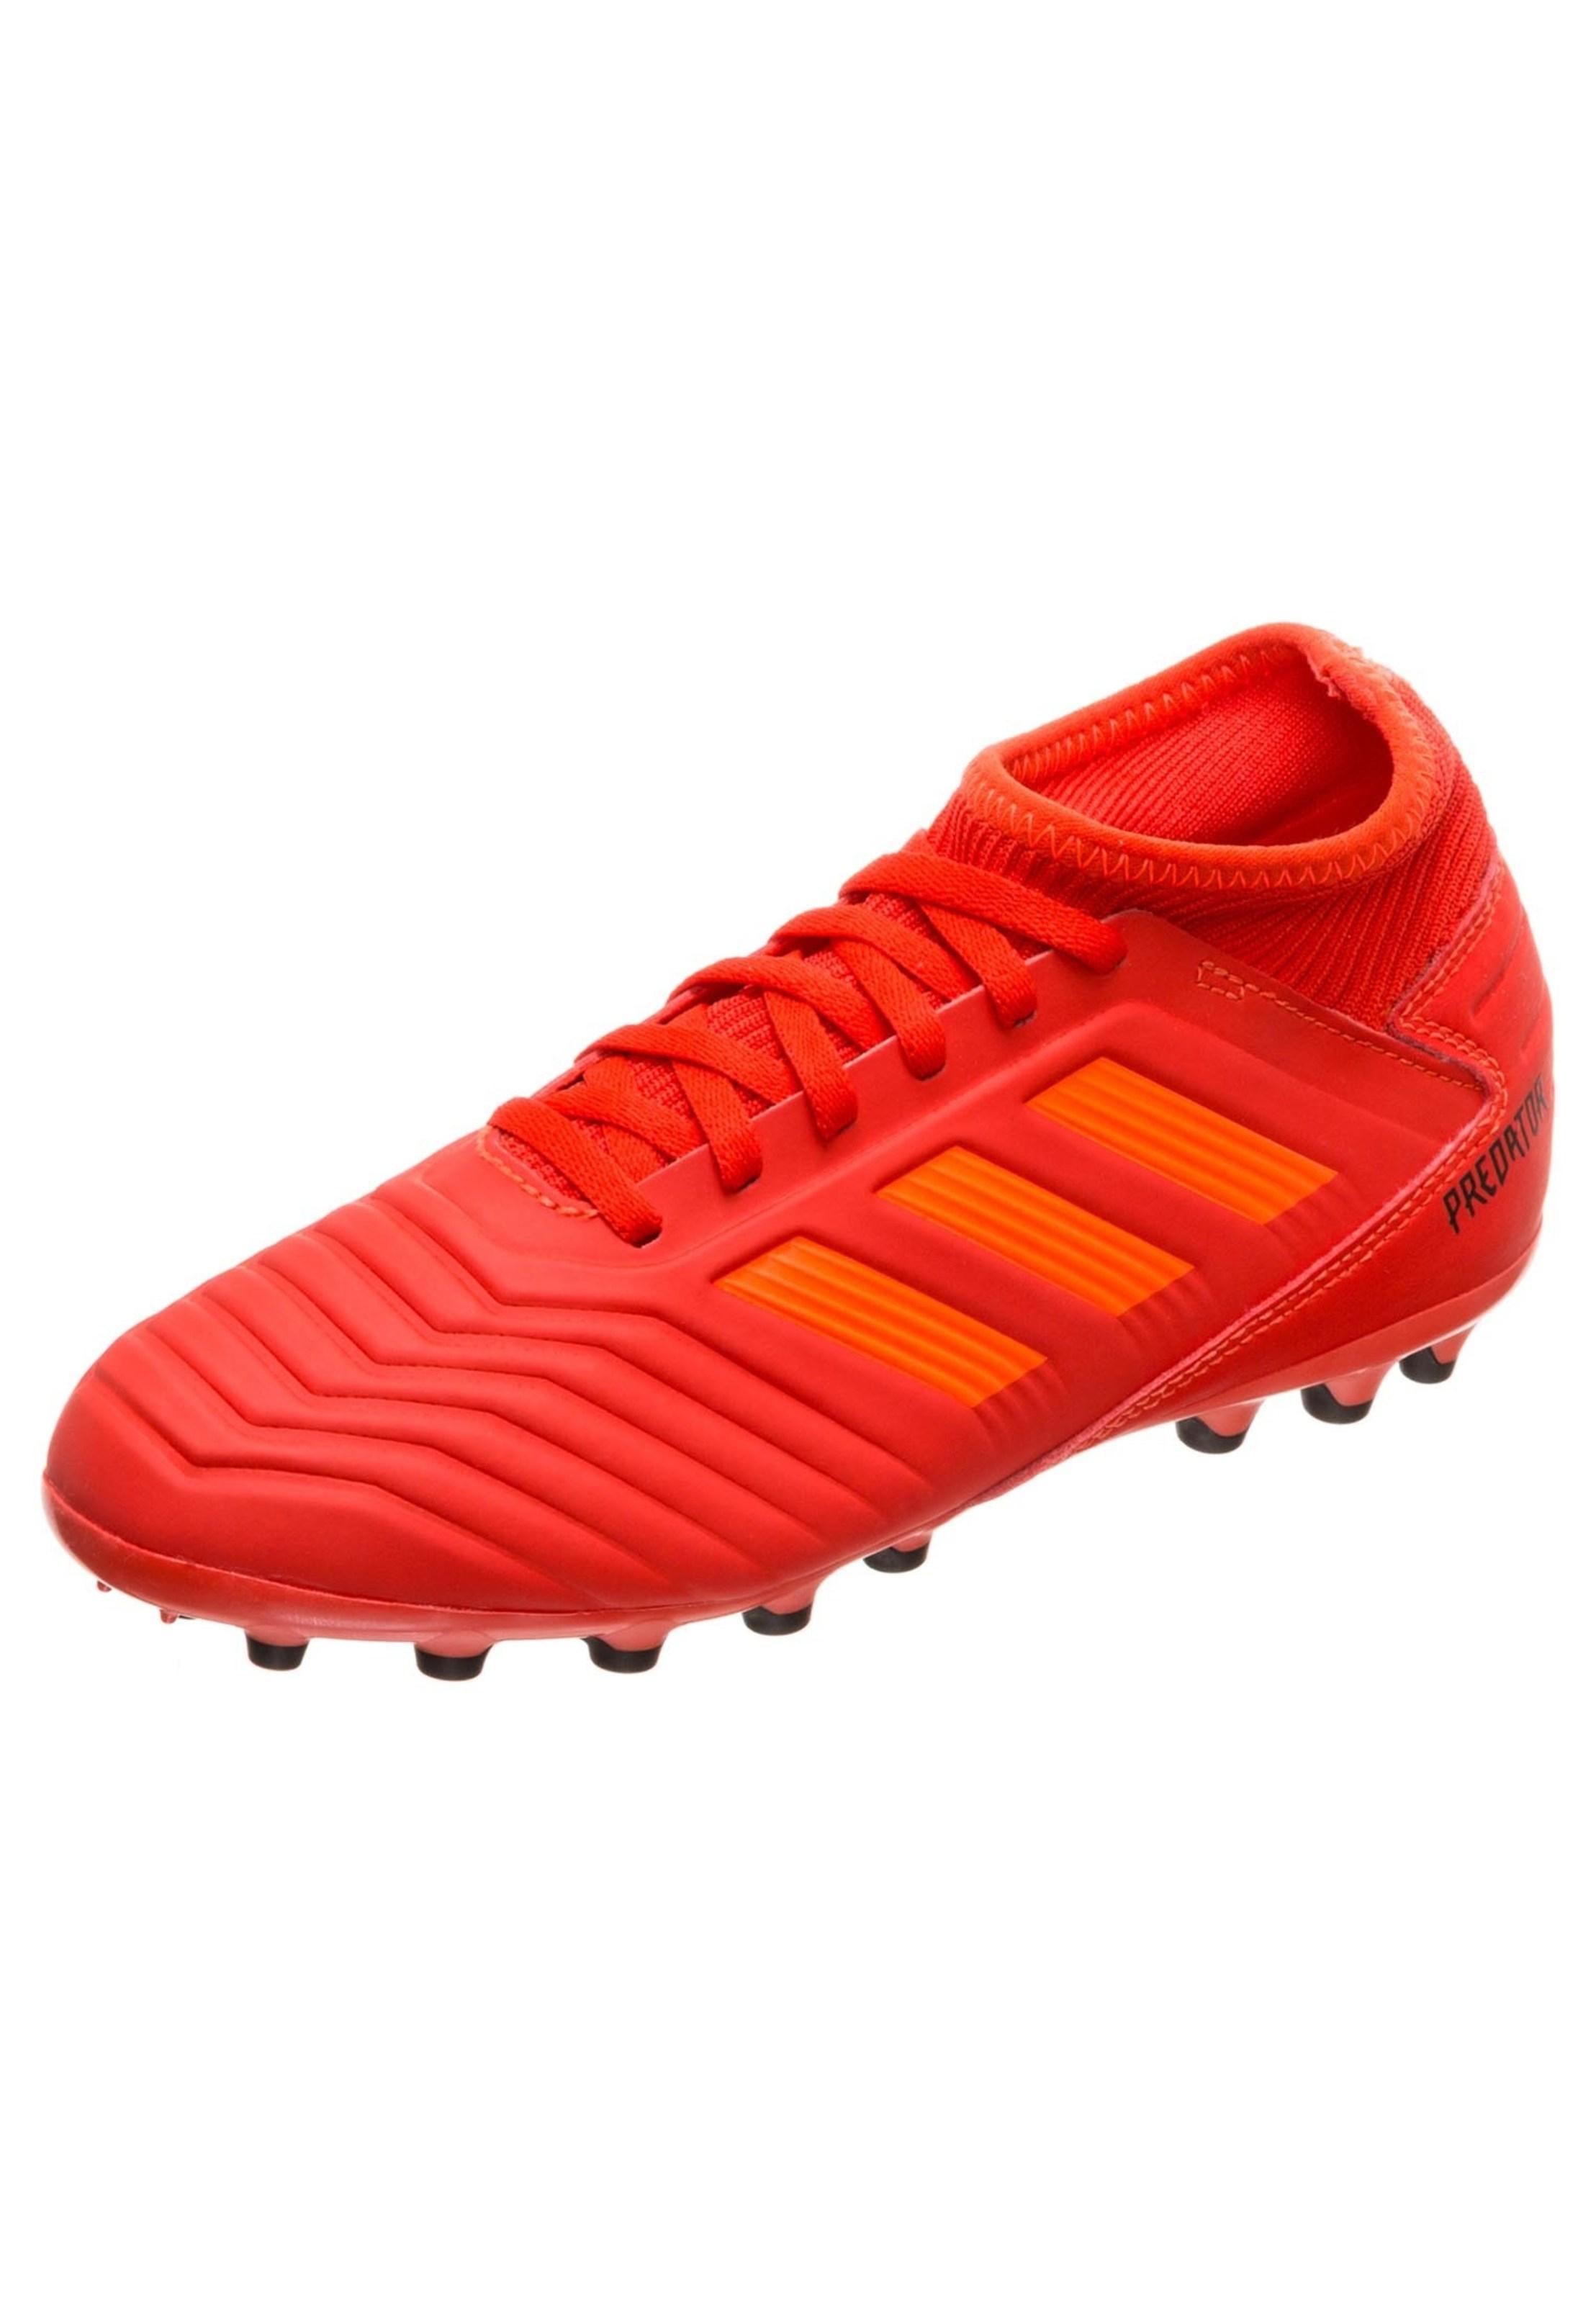 new style 2affd d1860 ADIDAS PERFORMANCE Sportovní boty  Predator 19.3 AG  červená. 1